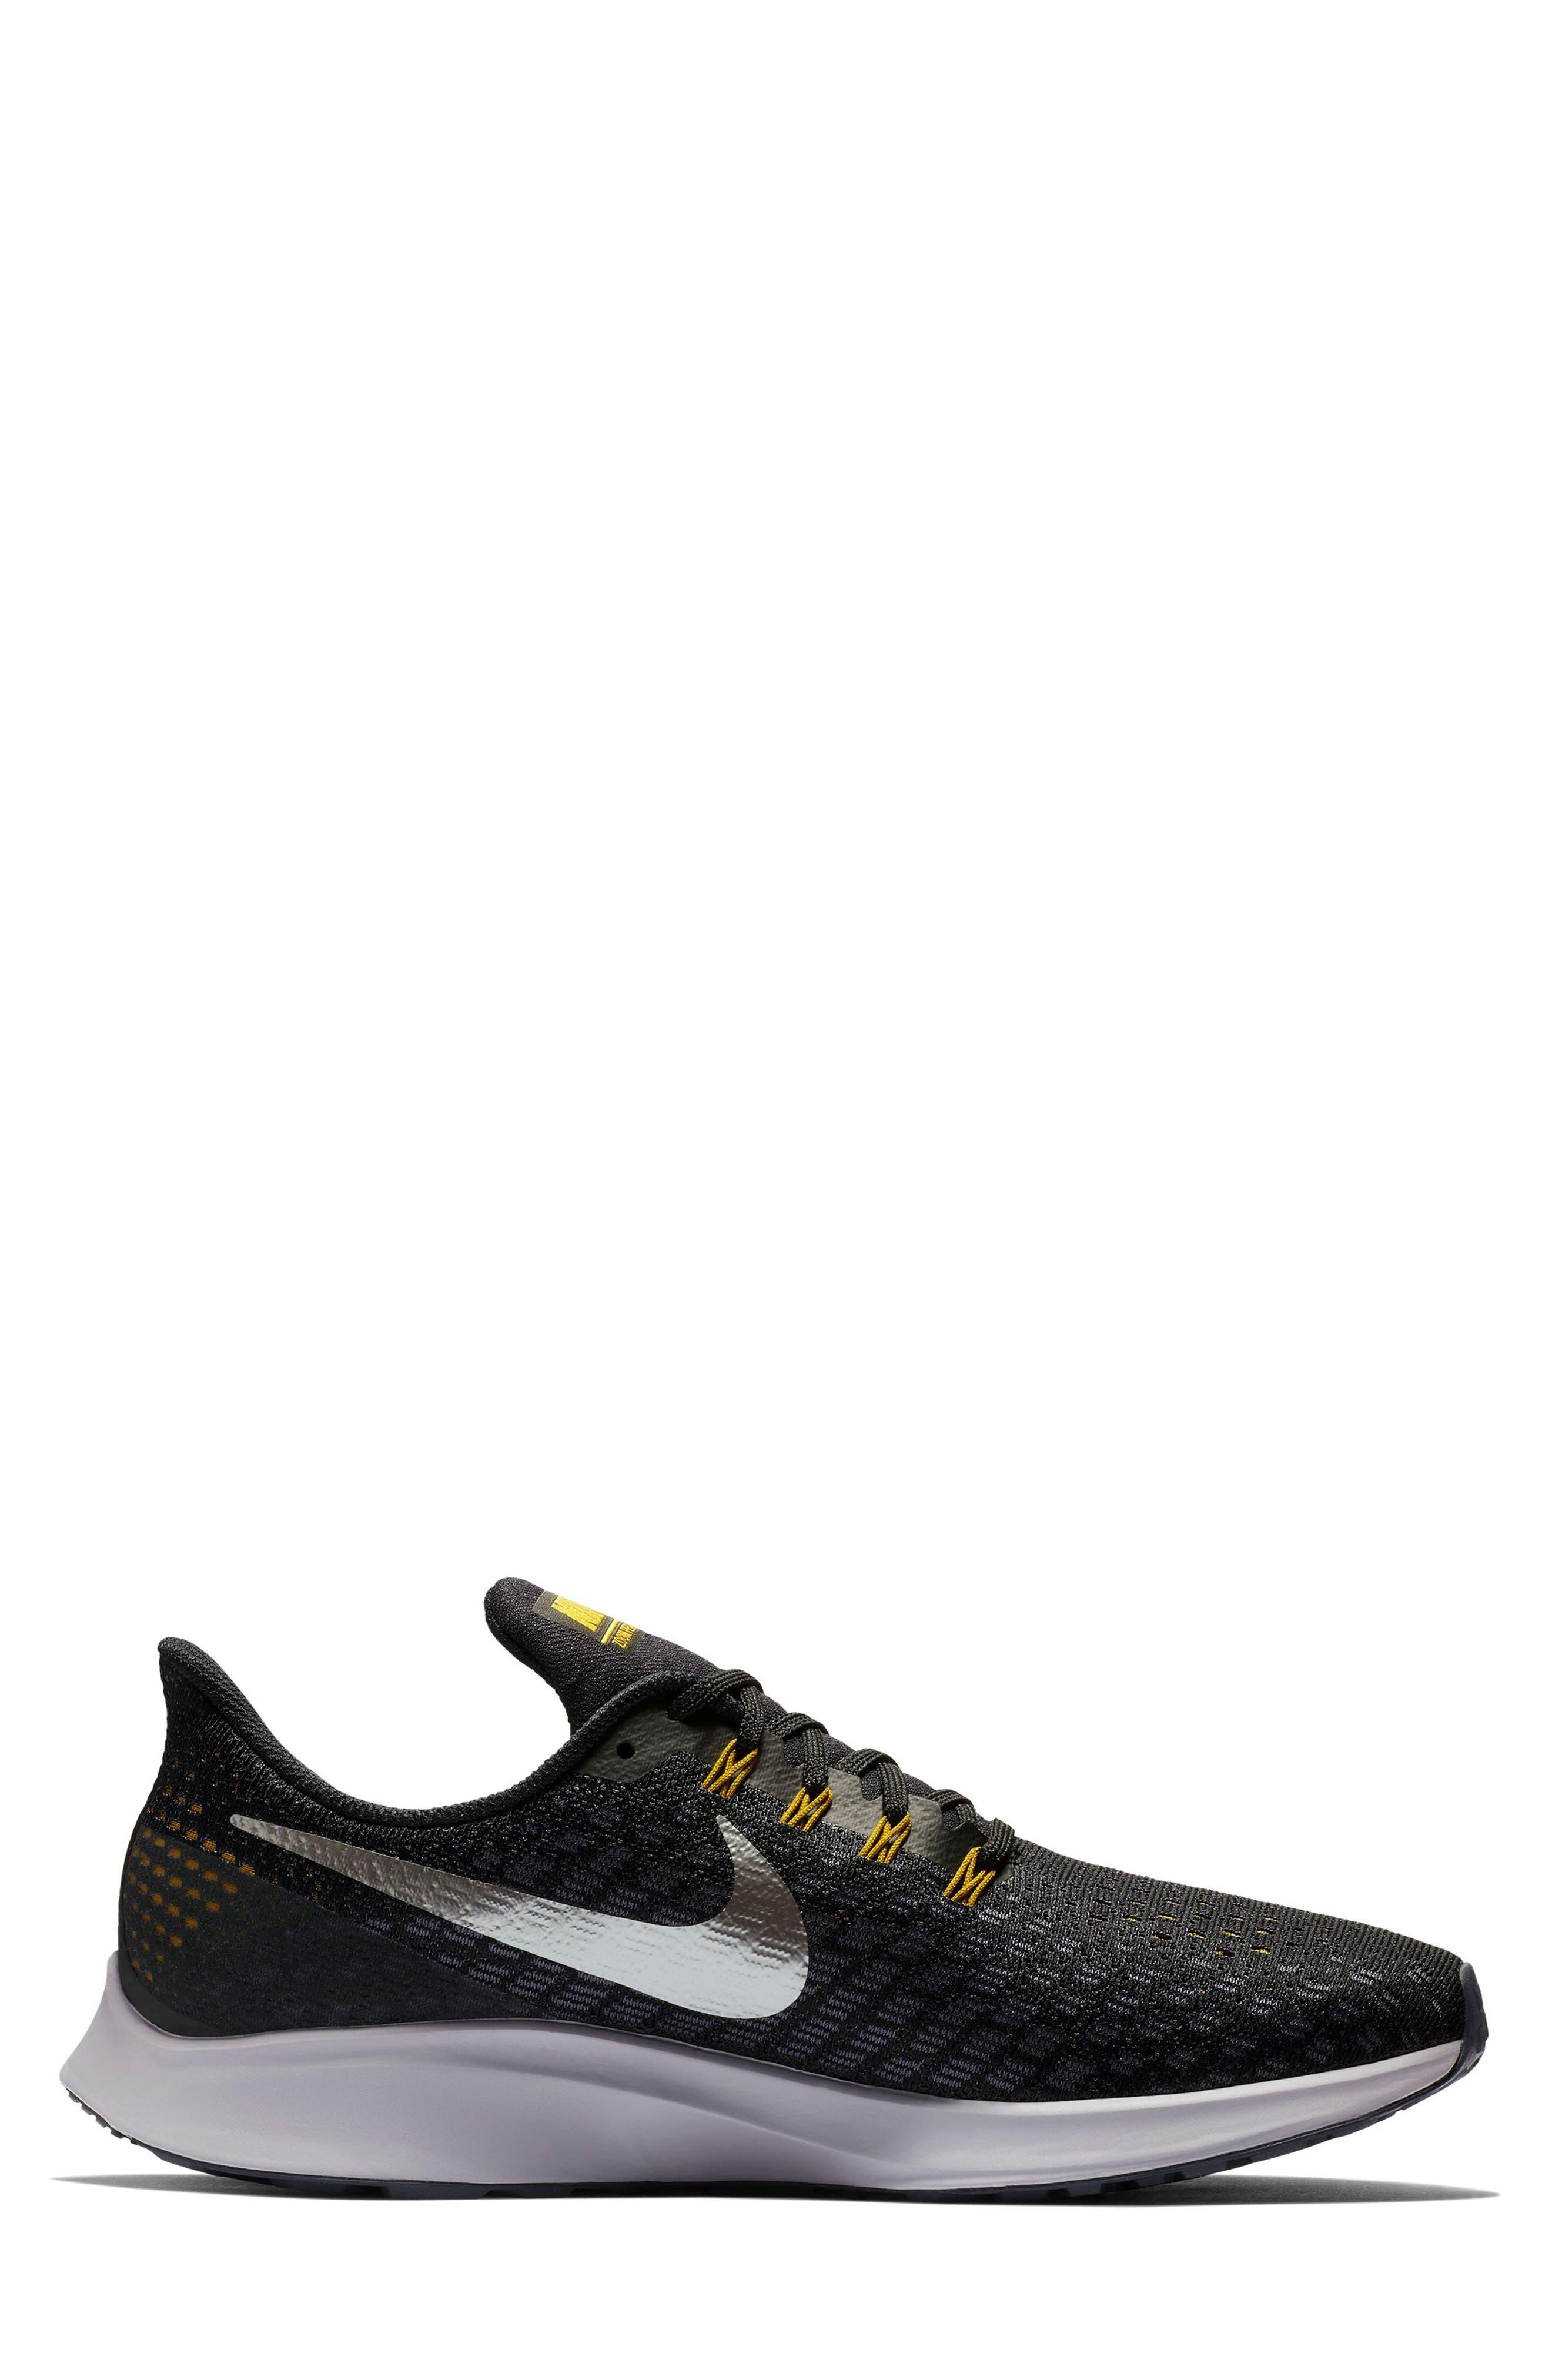 Air Zoom Pegasus 35 Running Shoe,                             Alternate thumbnail 2, color,                             BLACK/ PEWTER/ MOSS